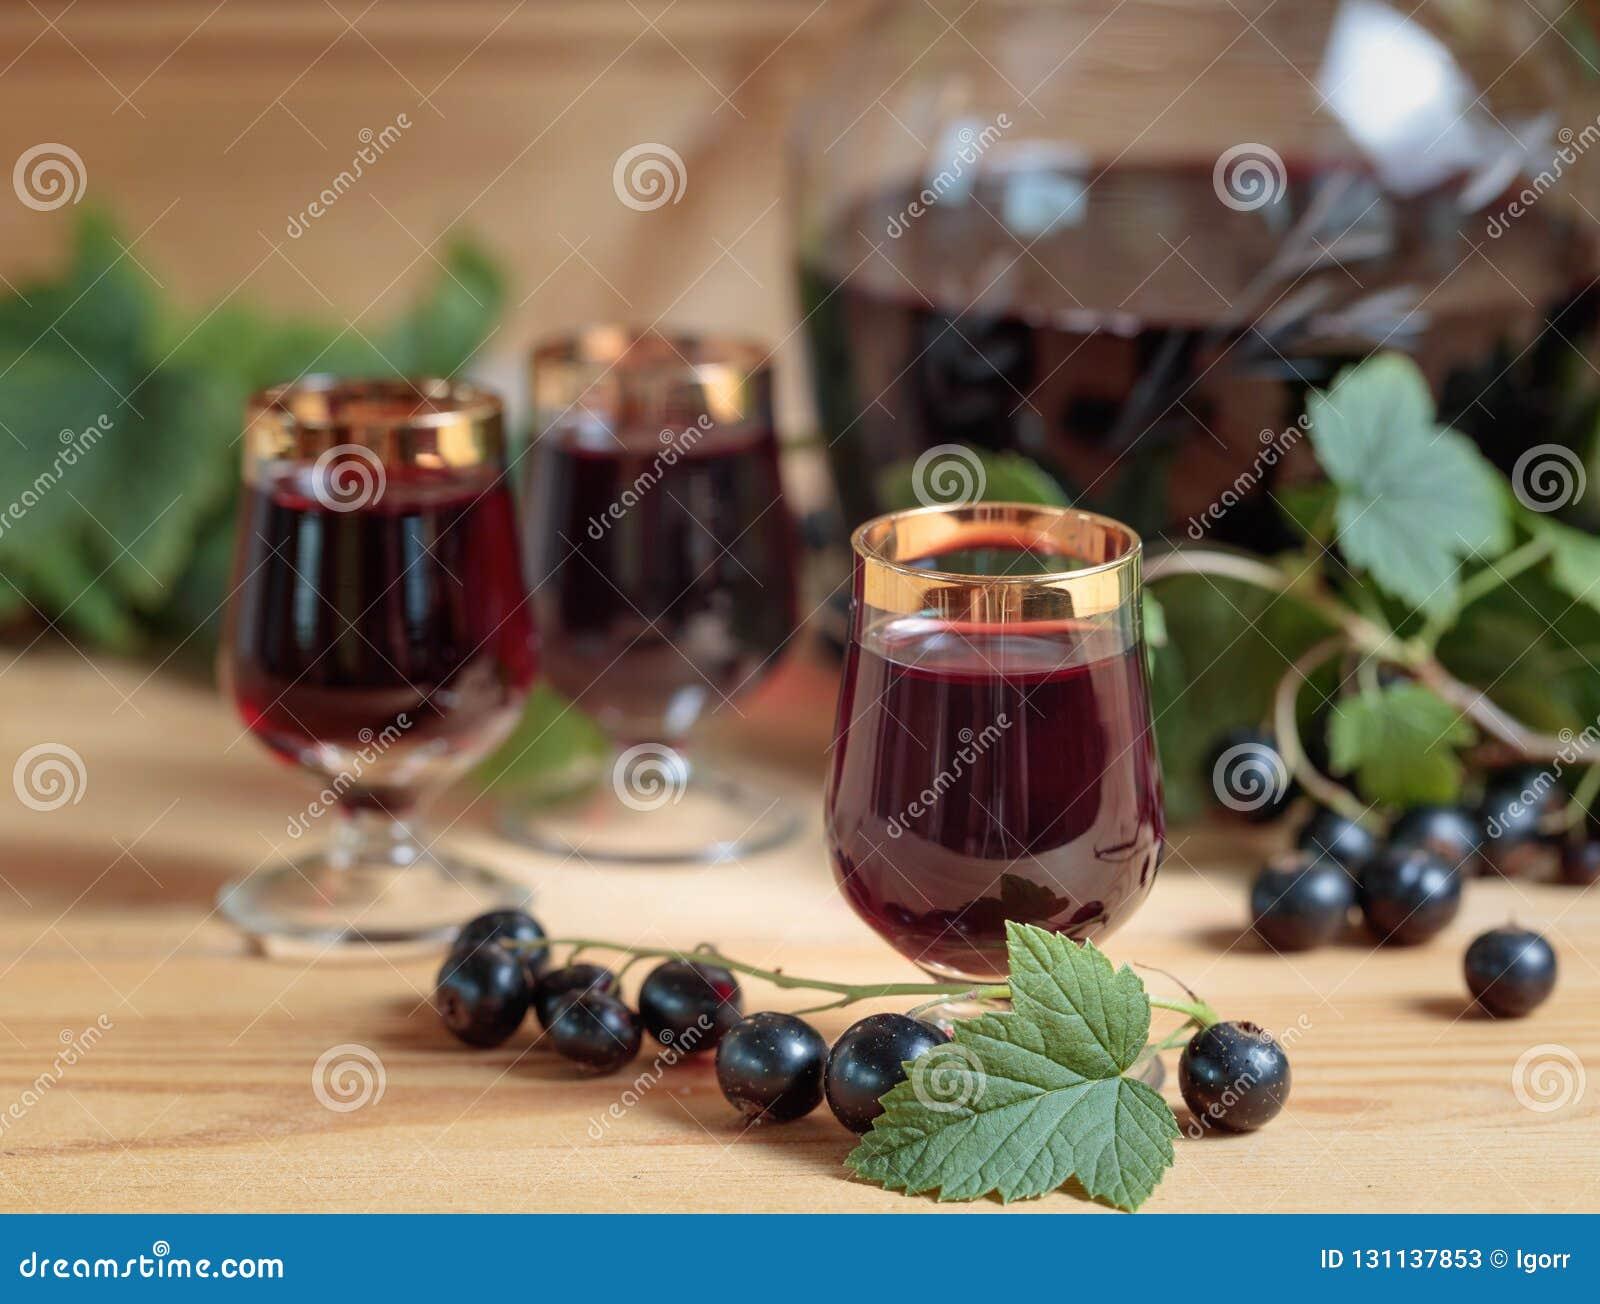 Homemade black currant liqueur and fresh berries .